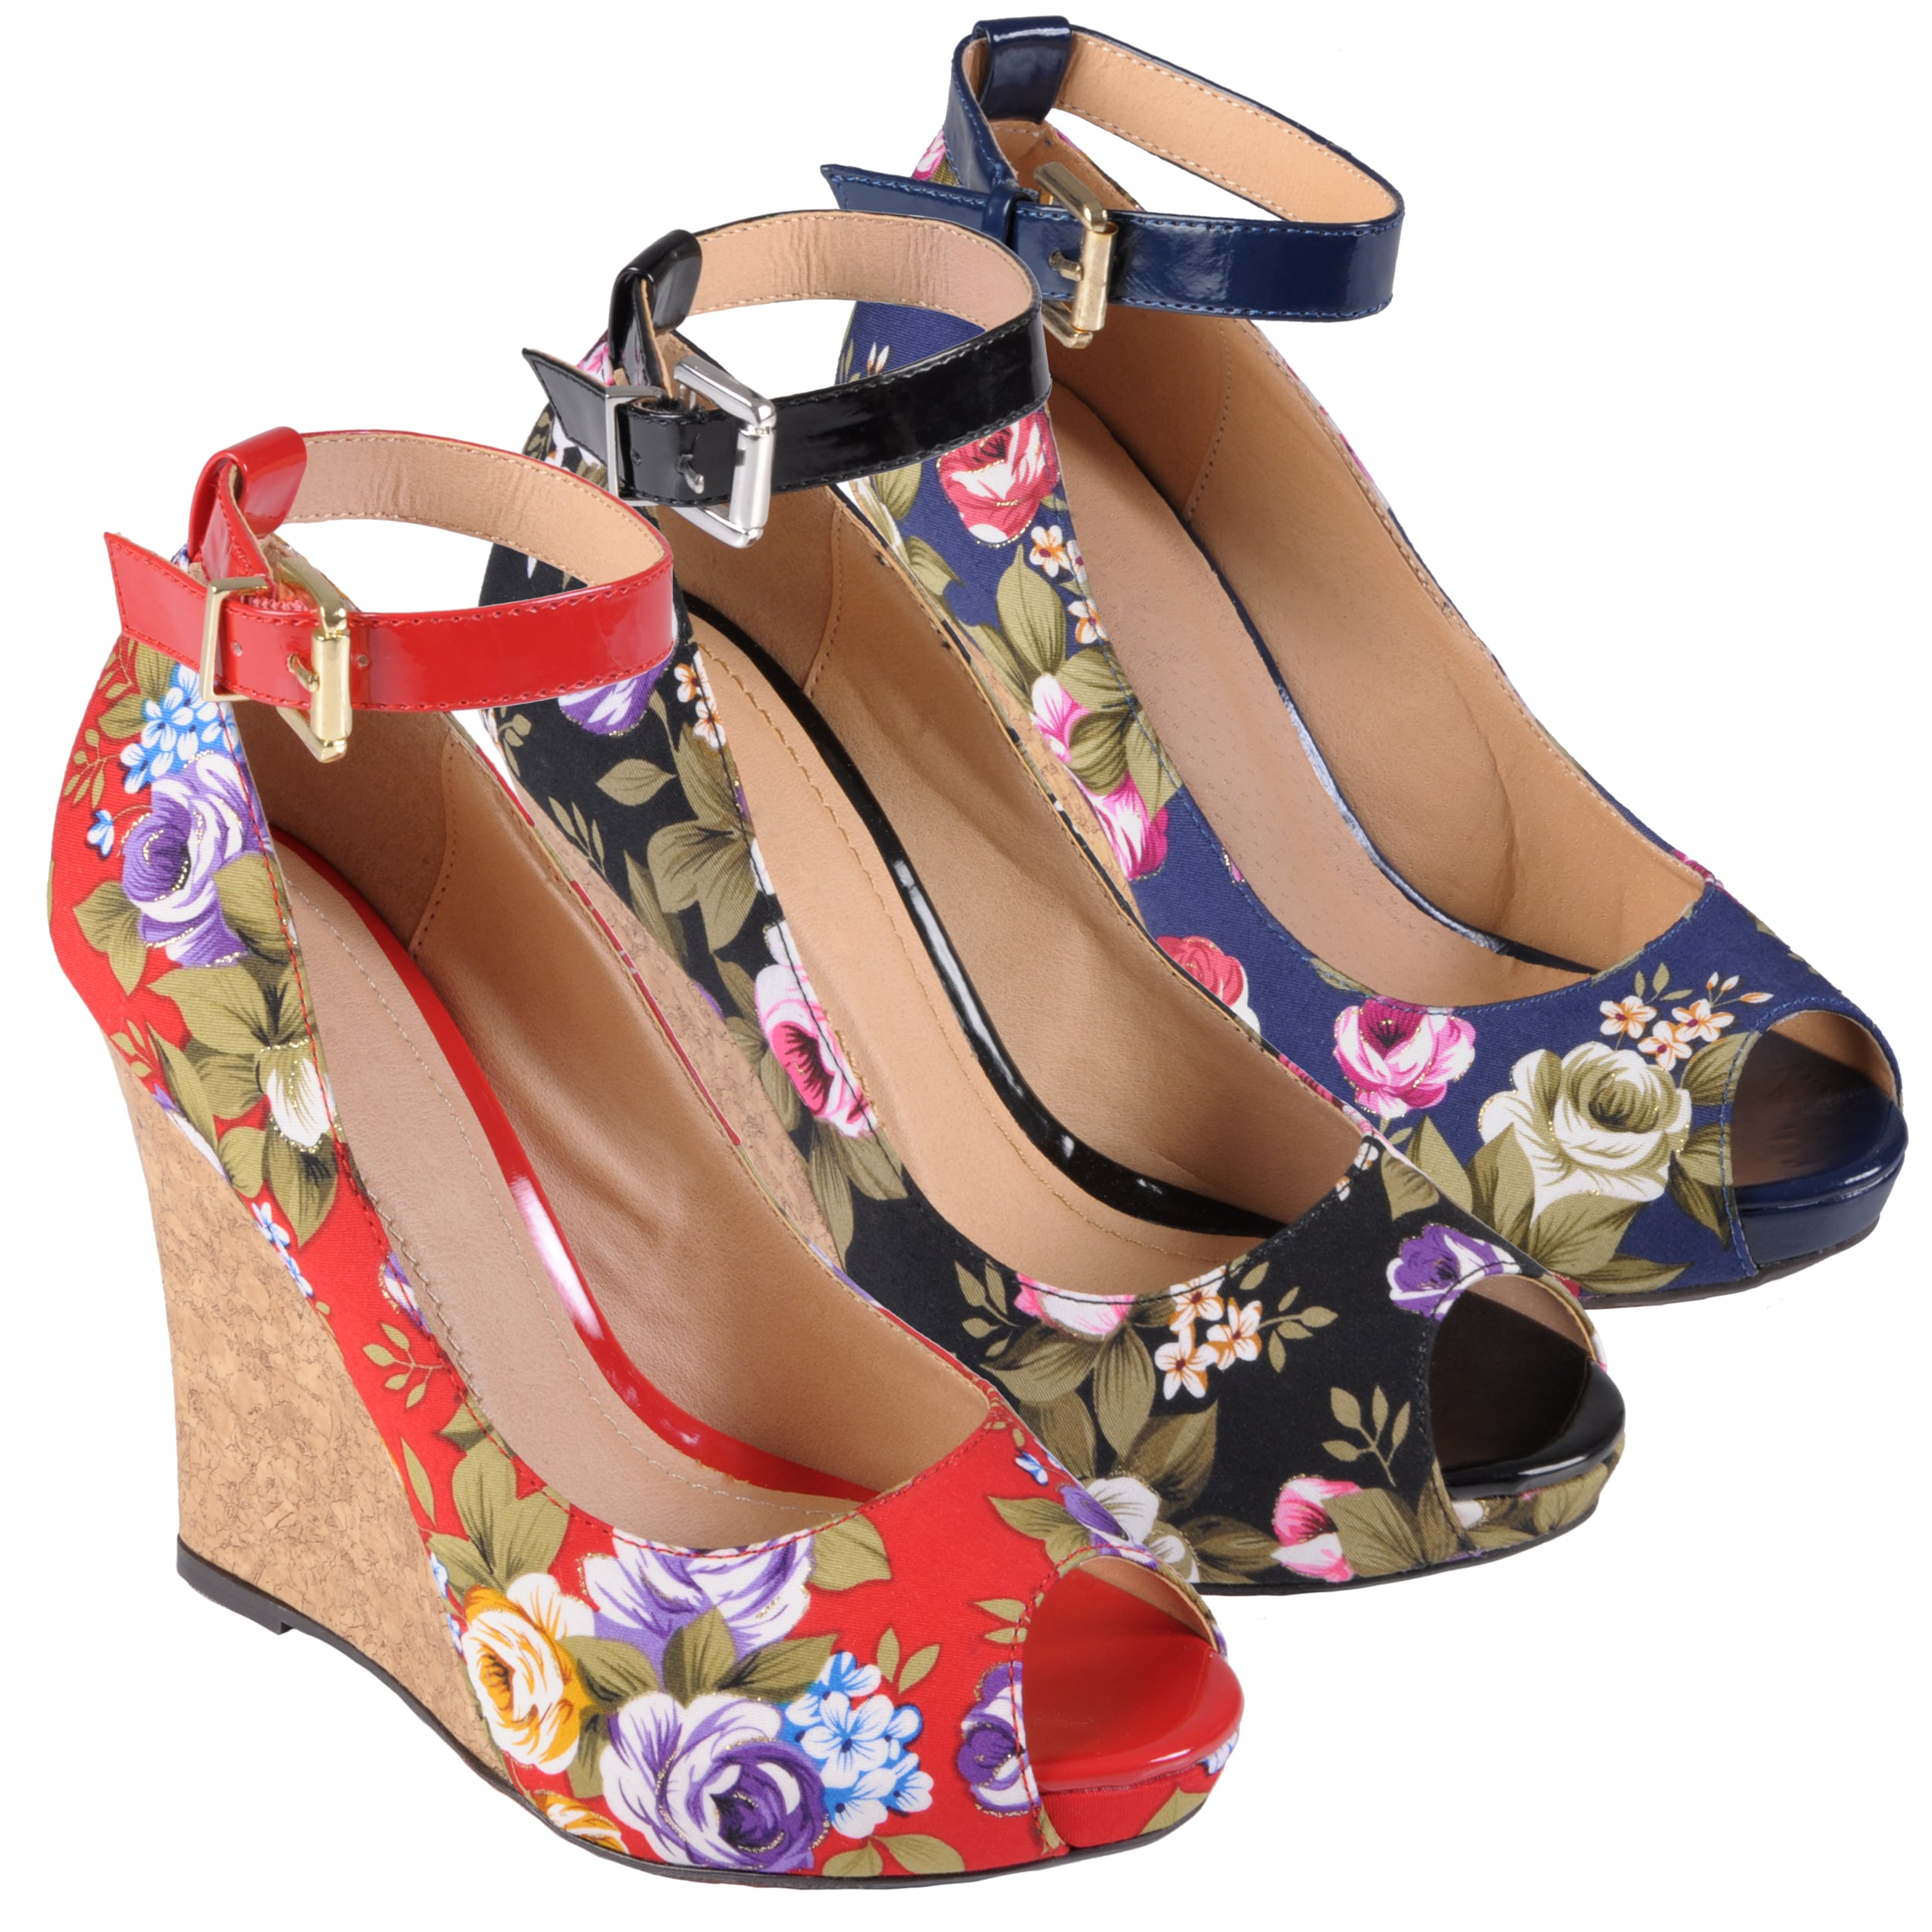 Hailey Jeans Co Women's 'Melt-38' Peep Toe Ankle Strap Wedge